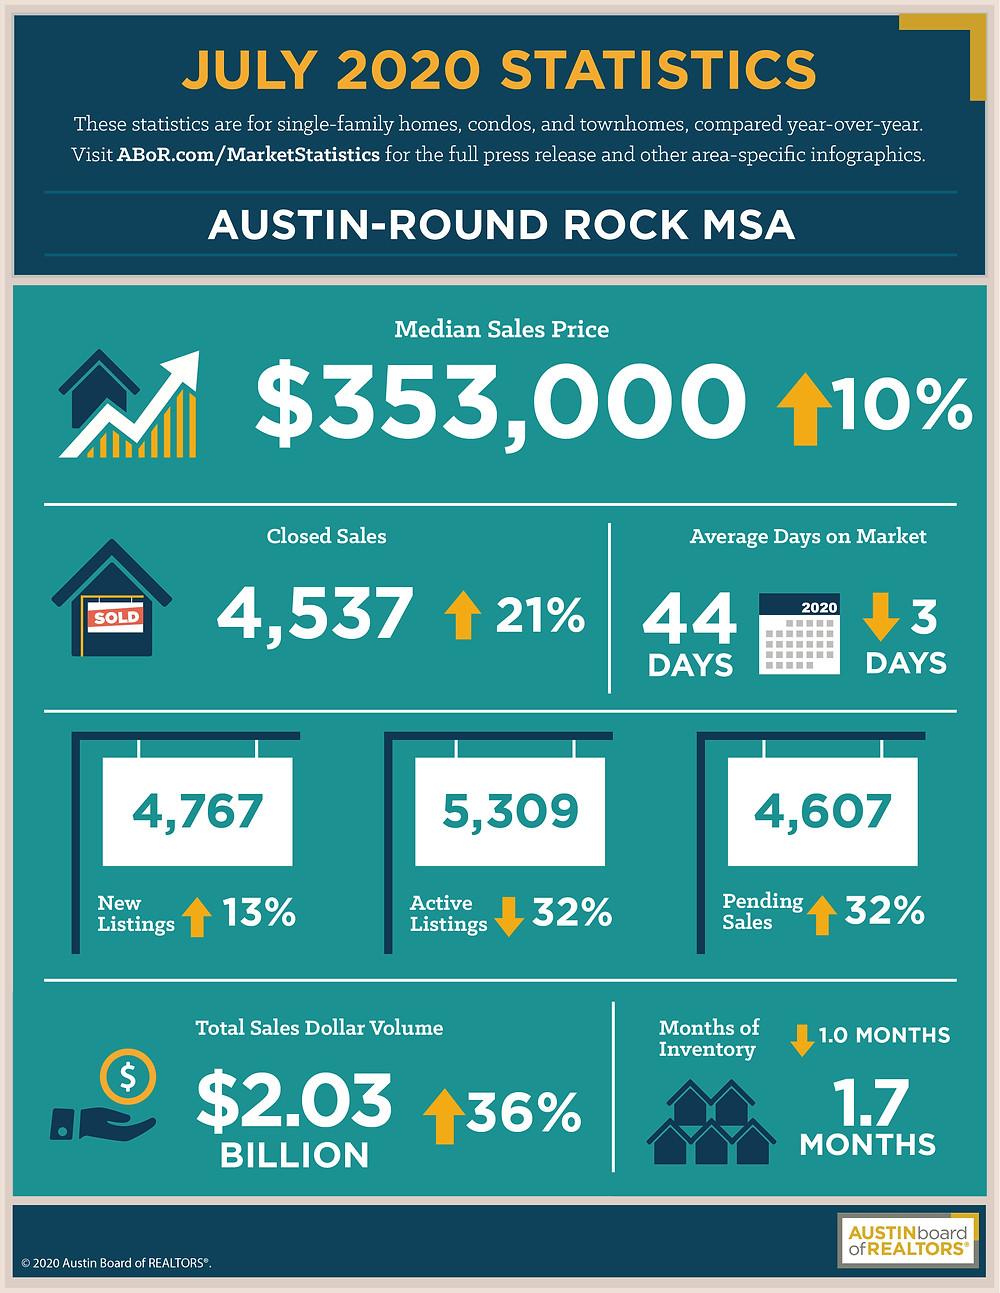 July 2020 Housing Statistics For The Austin-Round Rock MSA